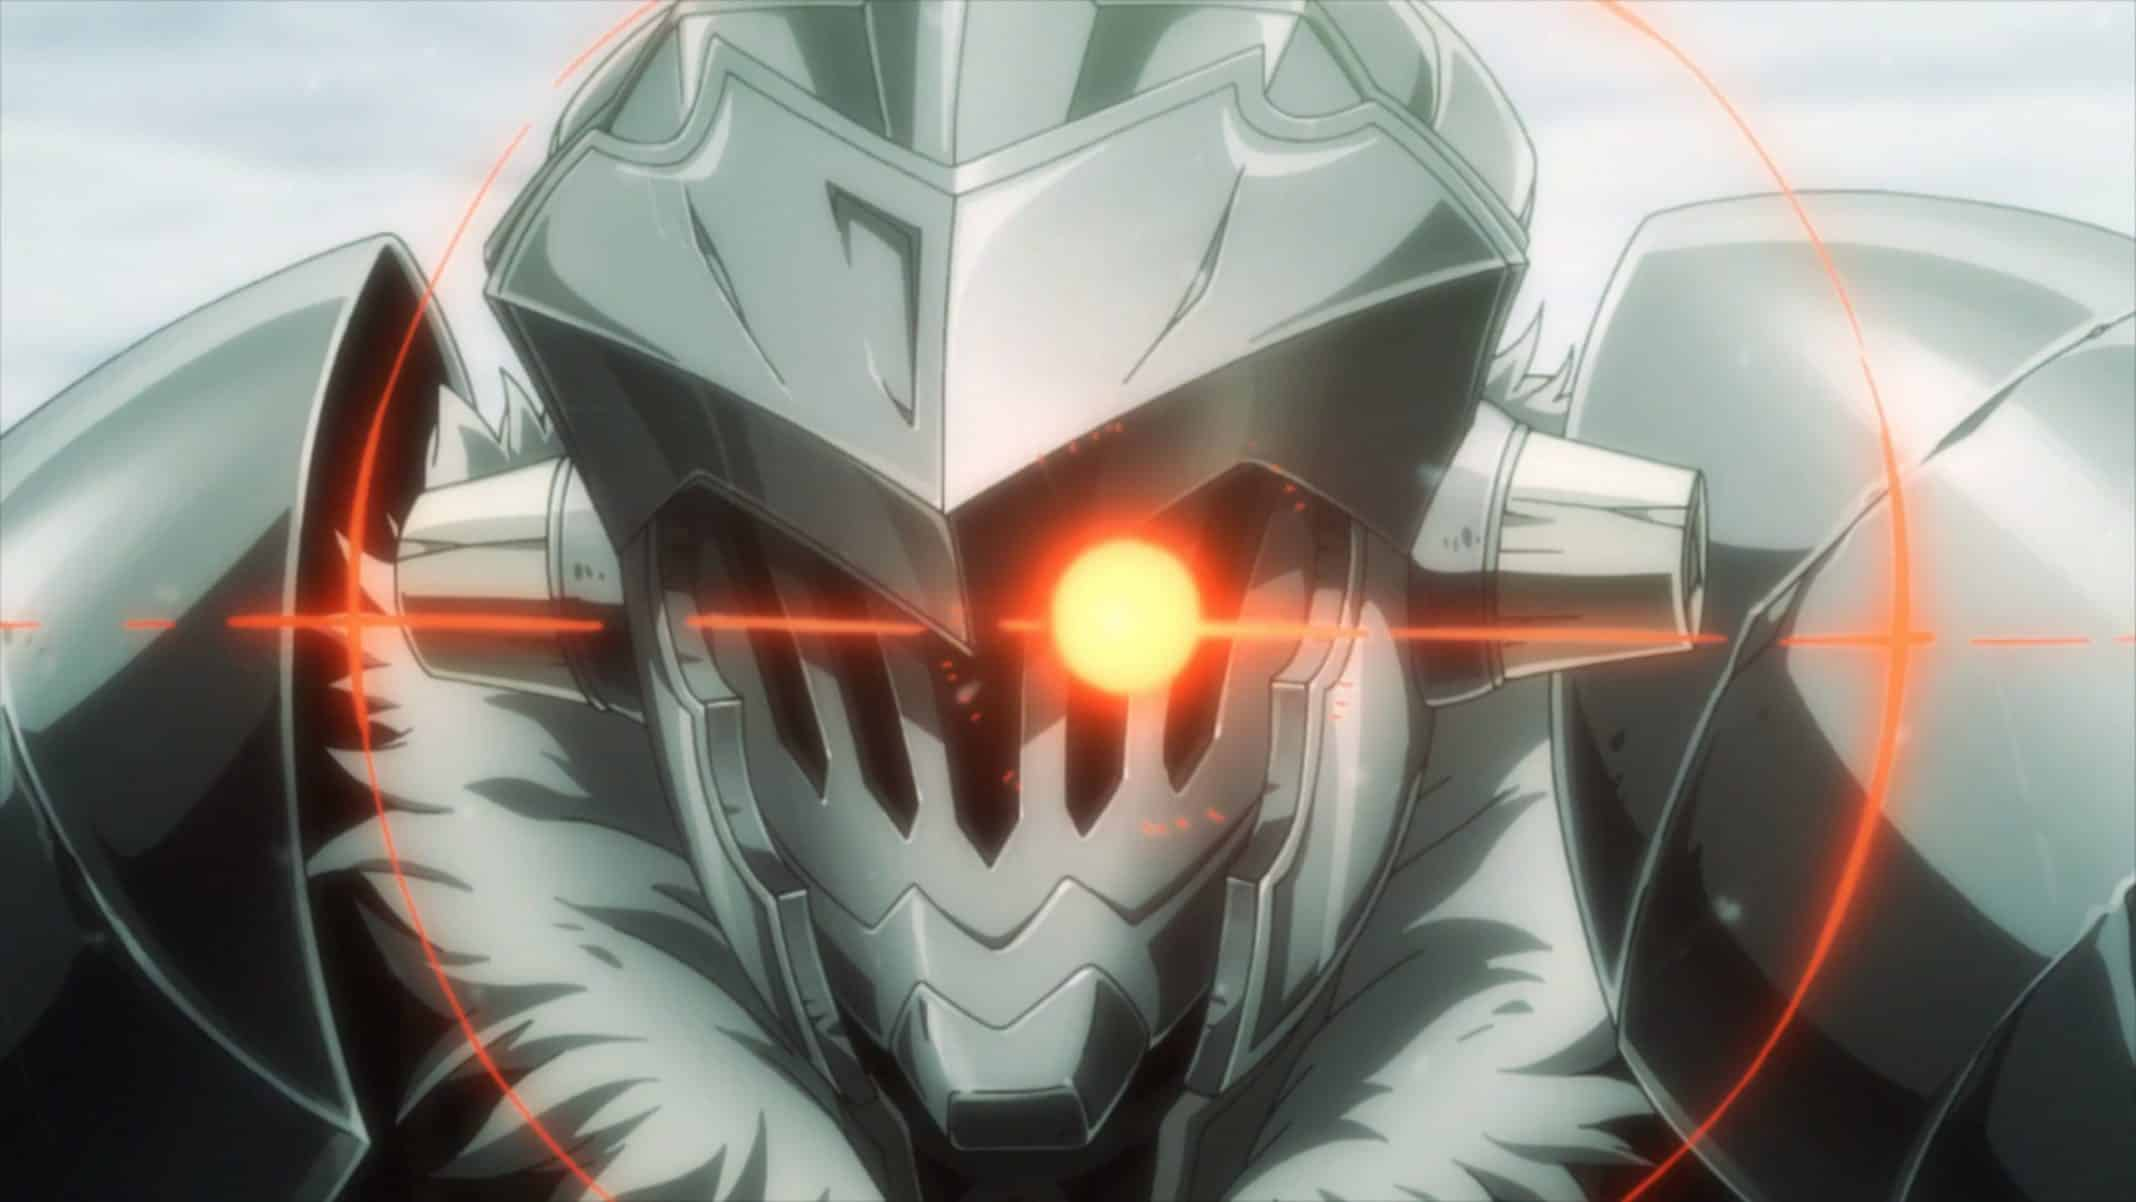 Goblin Slayer (Umehara Yuuichirou) about to go into overdrive.